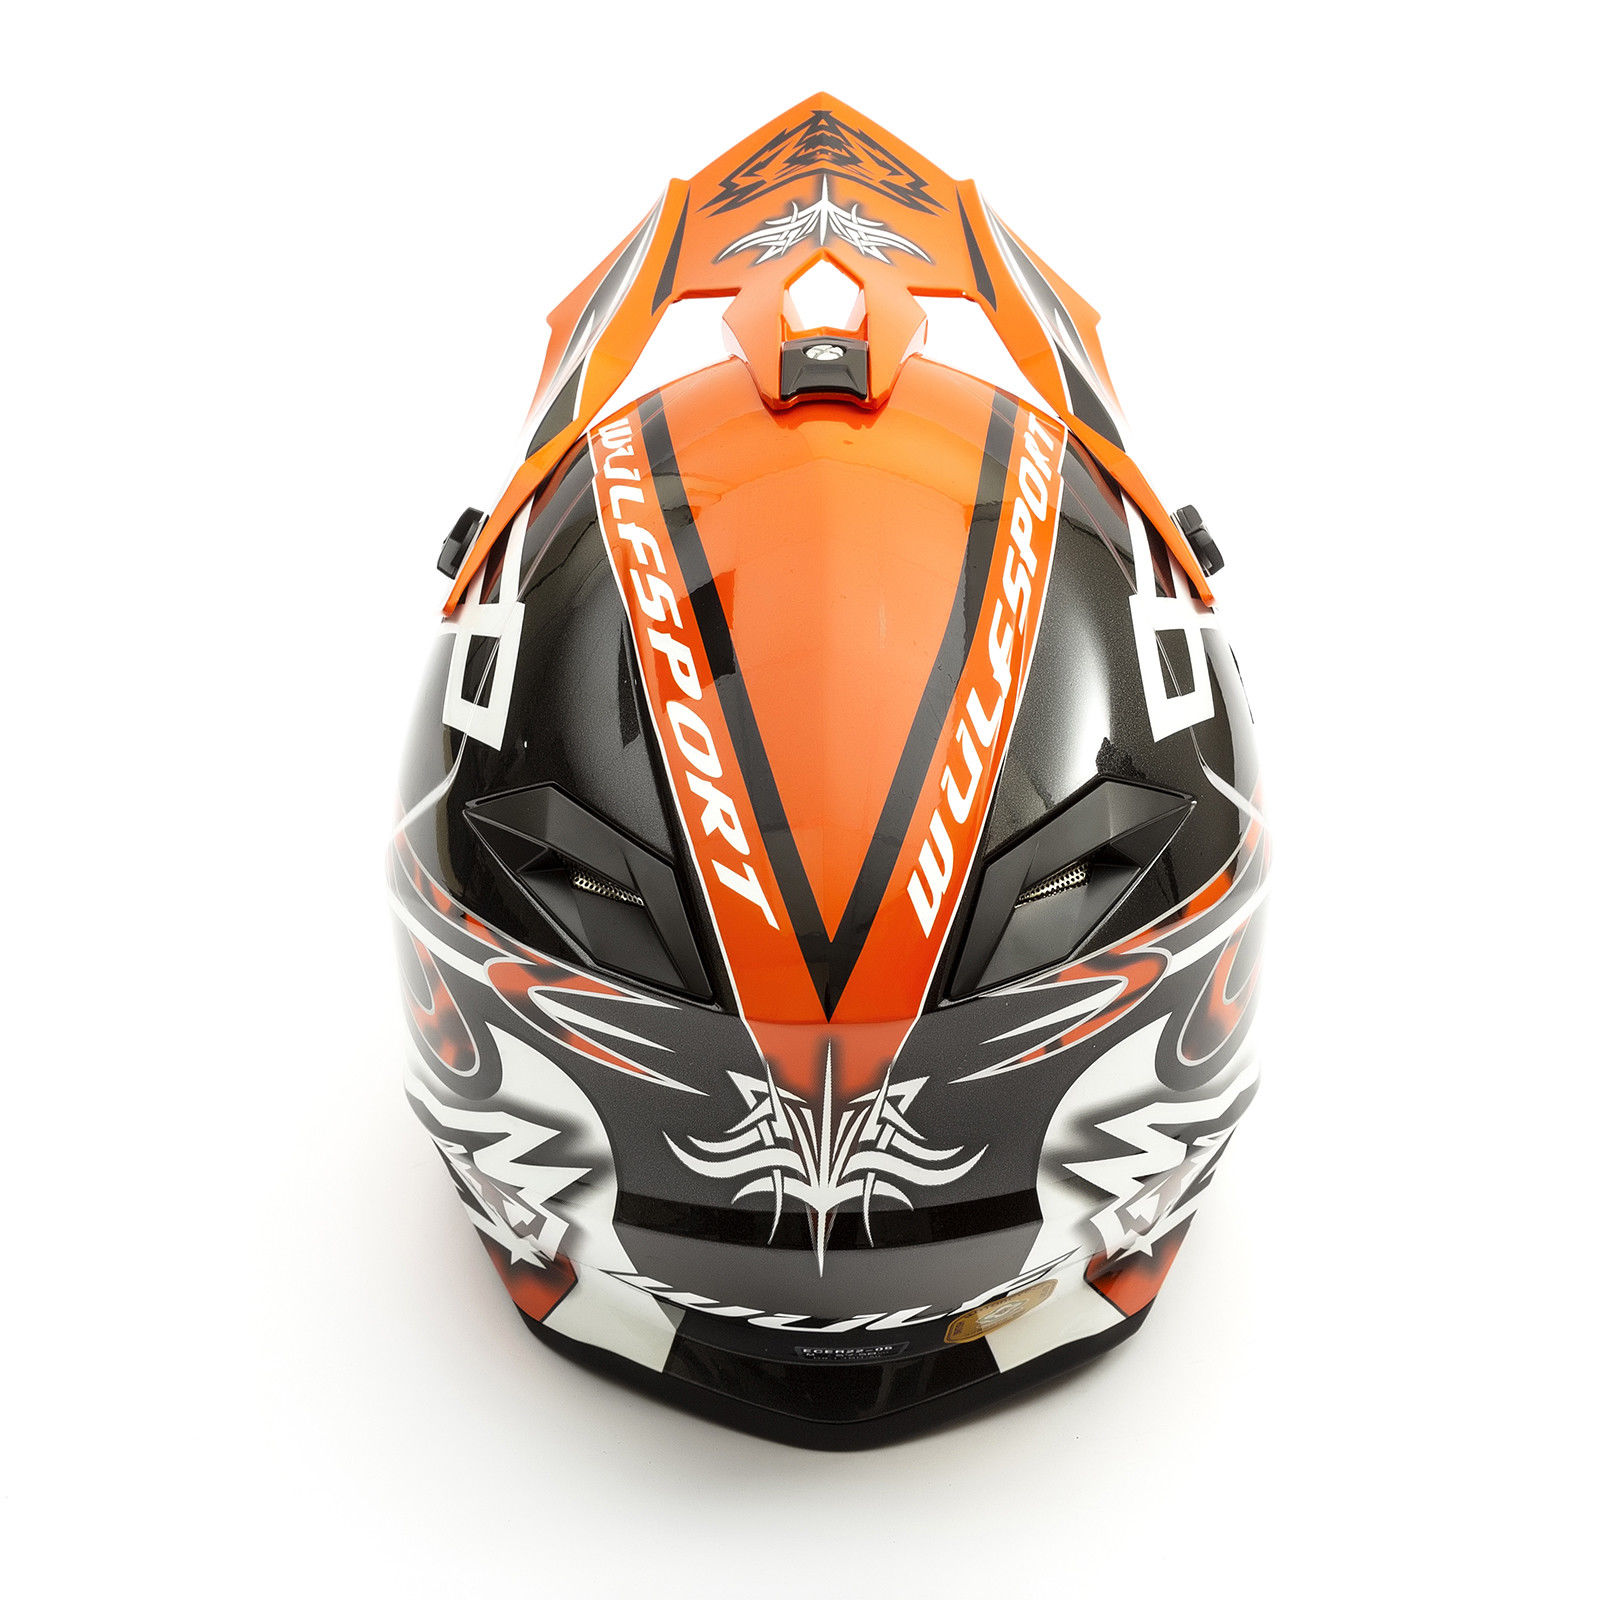 Wulfsport-Adult-Sceptre-Helmets-Motocross-Pitbike-Motorbike-Off-Road-Racing-ATV thumbnail 78